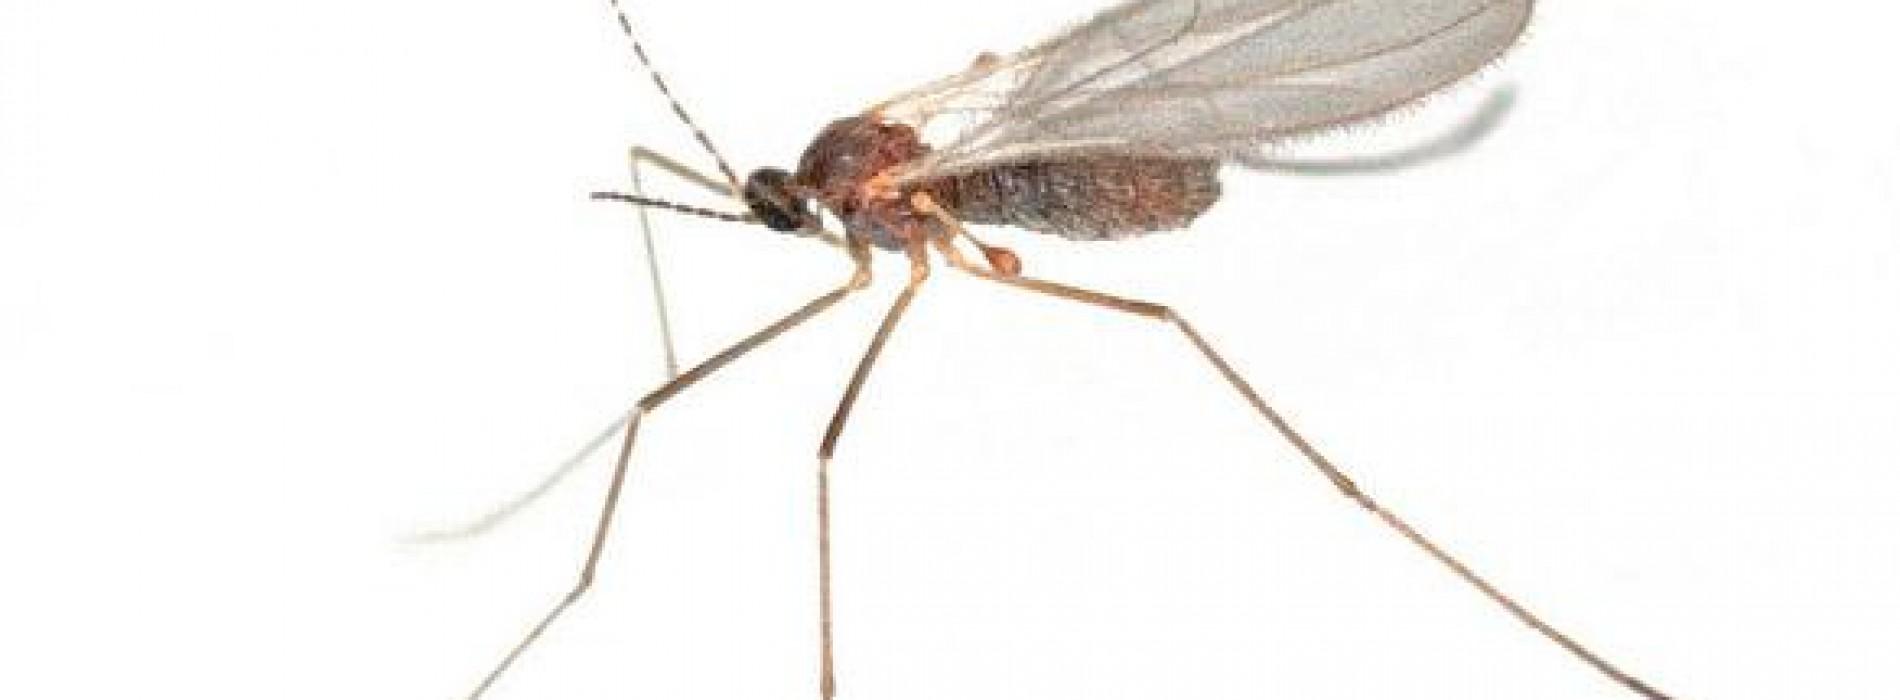 Er is een heel simpel middel om sneller van je muggenbult af te komen